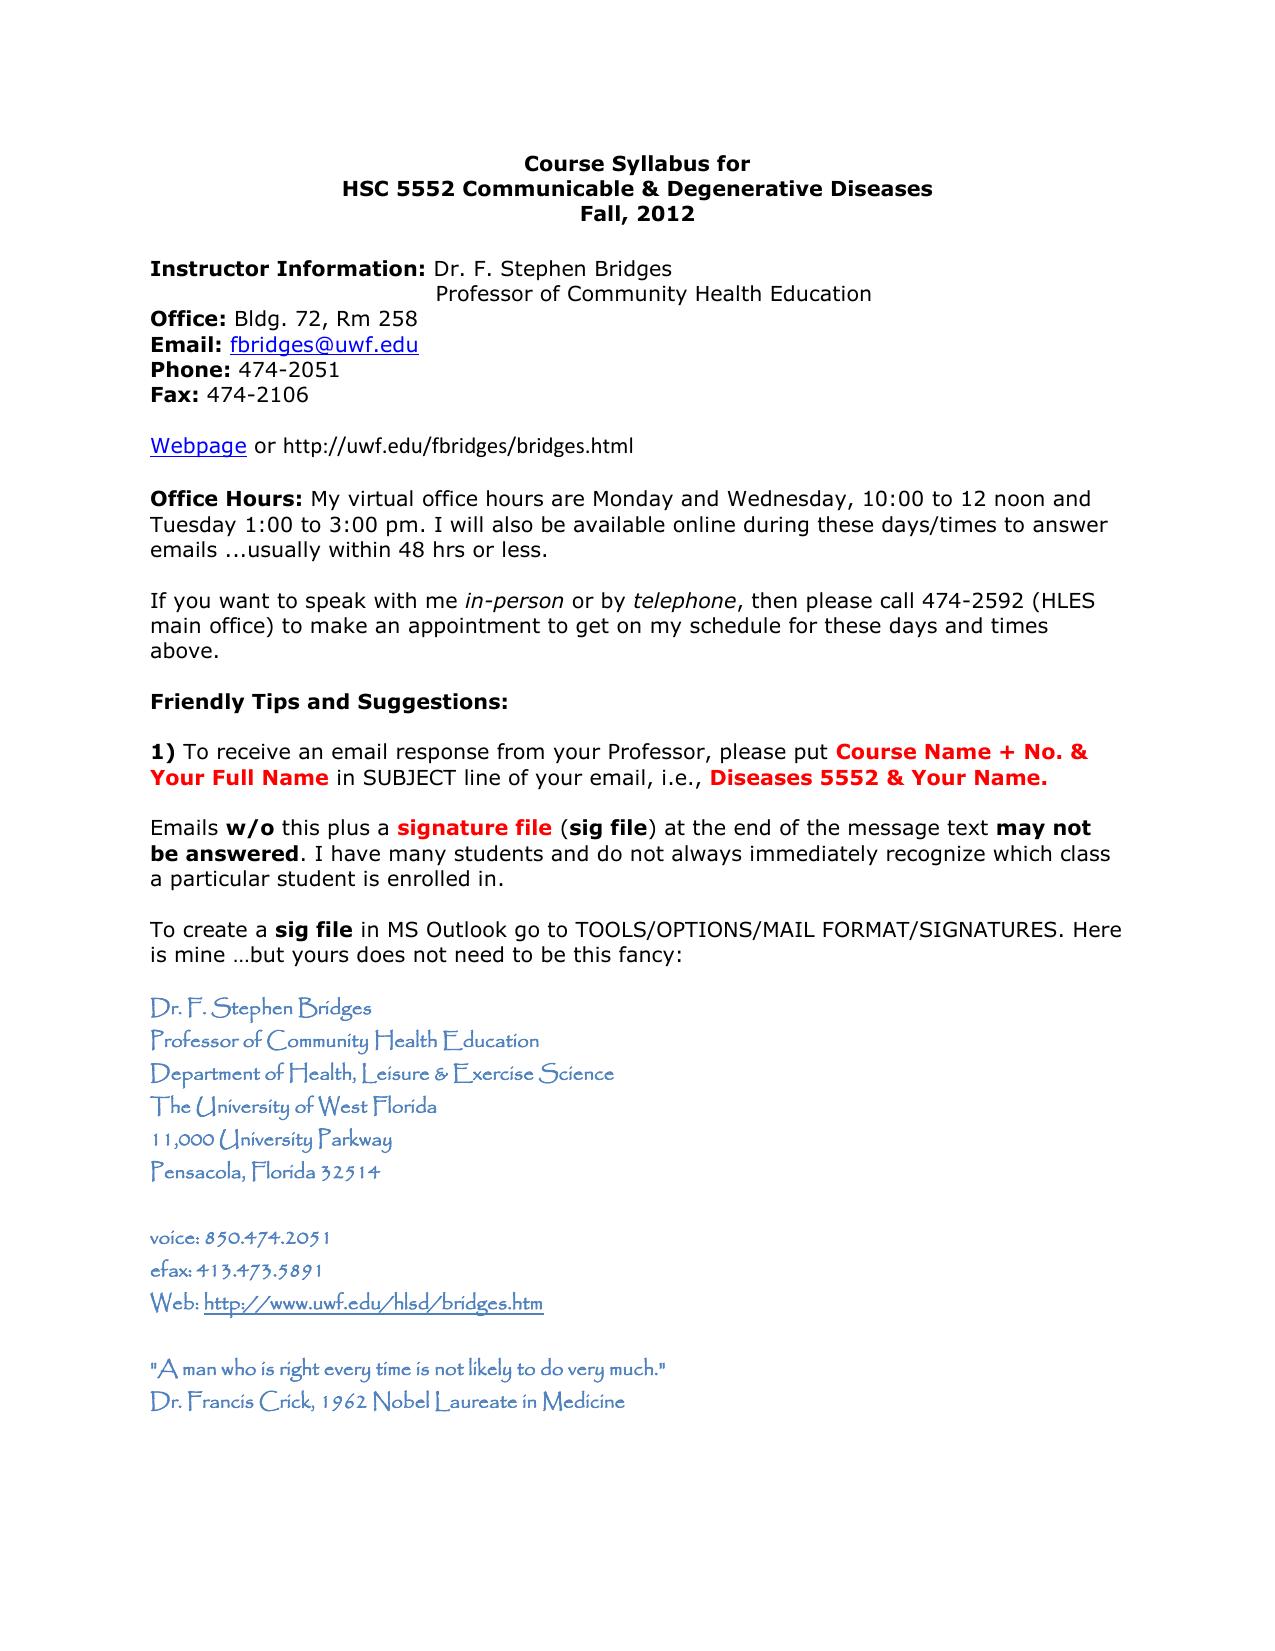 Course Syllabus For Hsc 5552 Communicable Degenerative